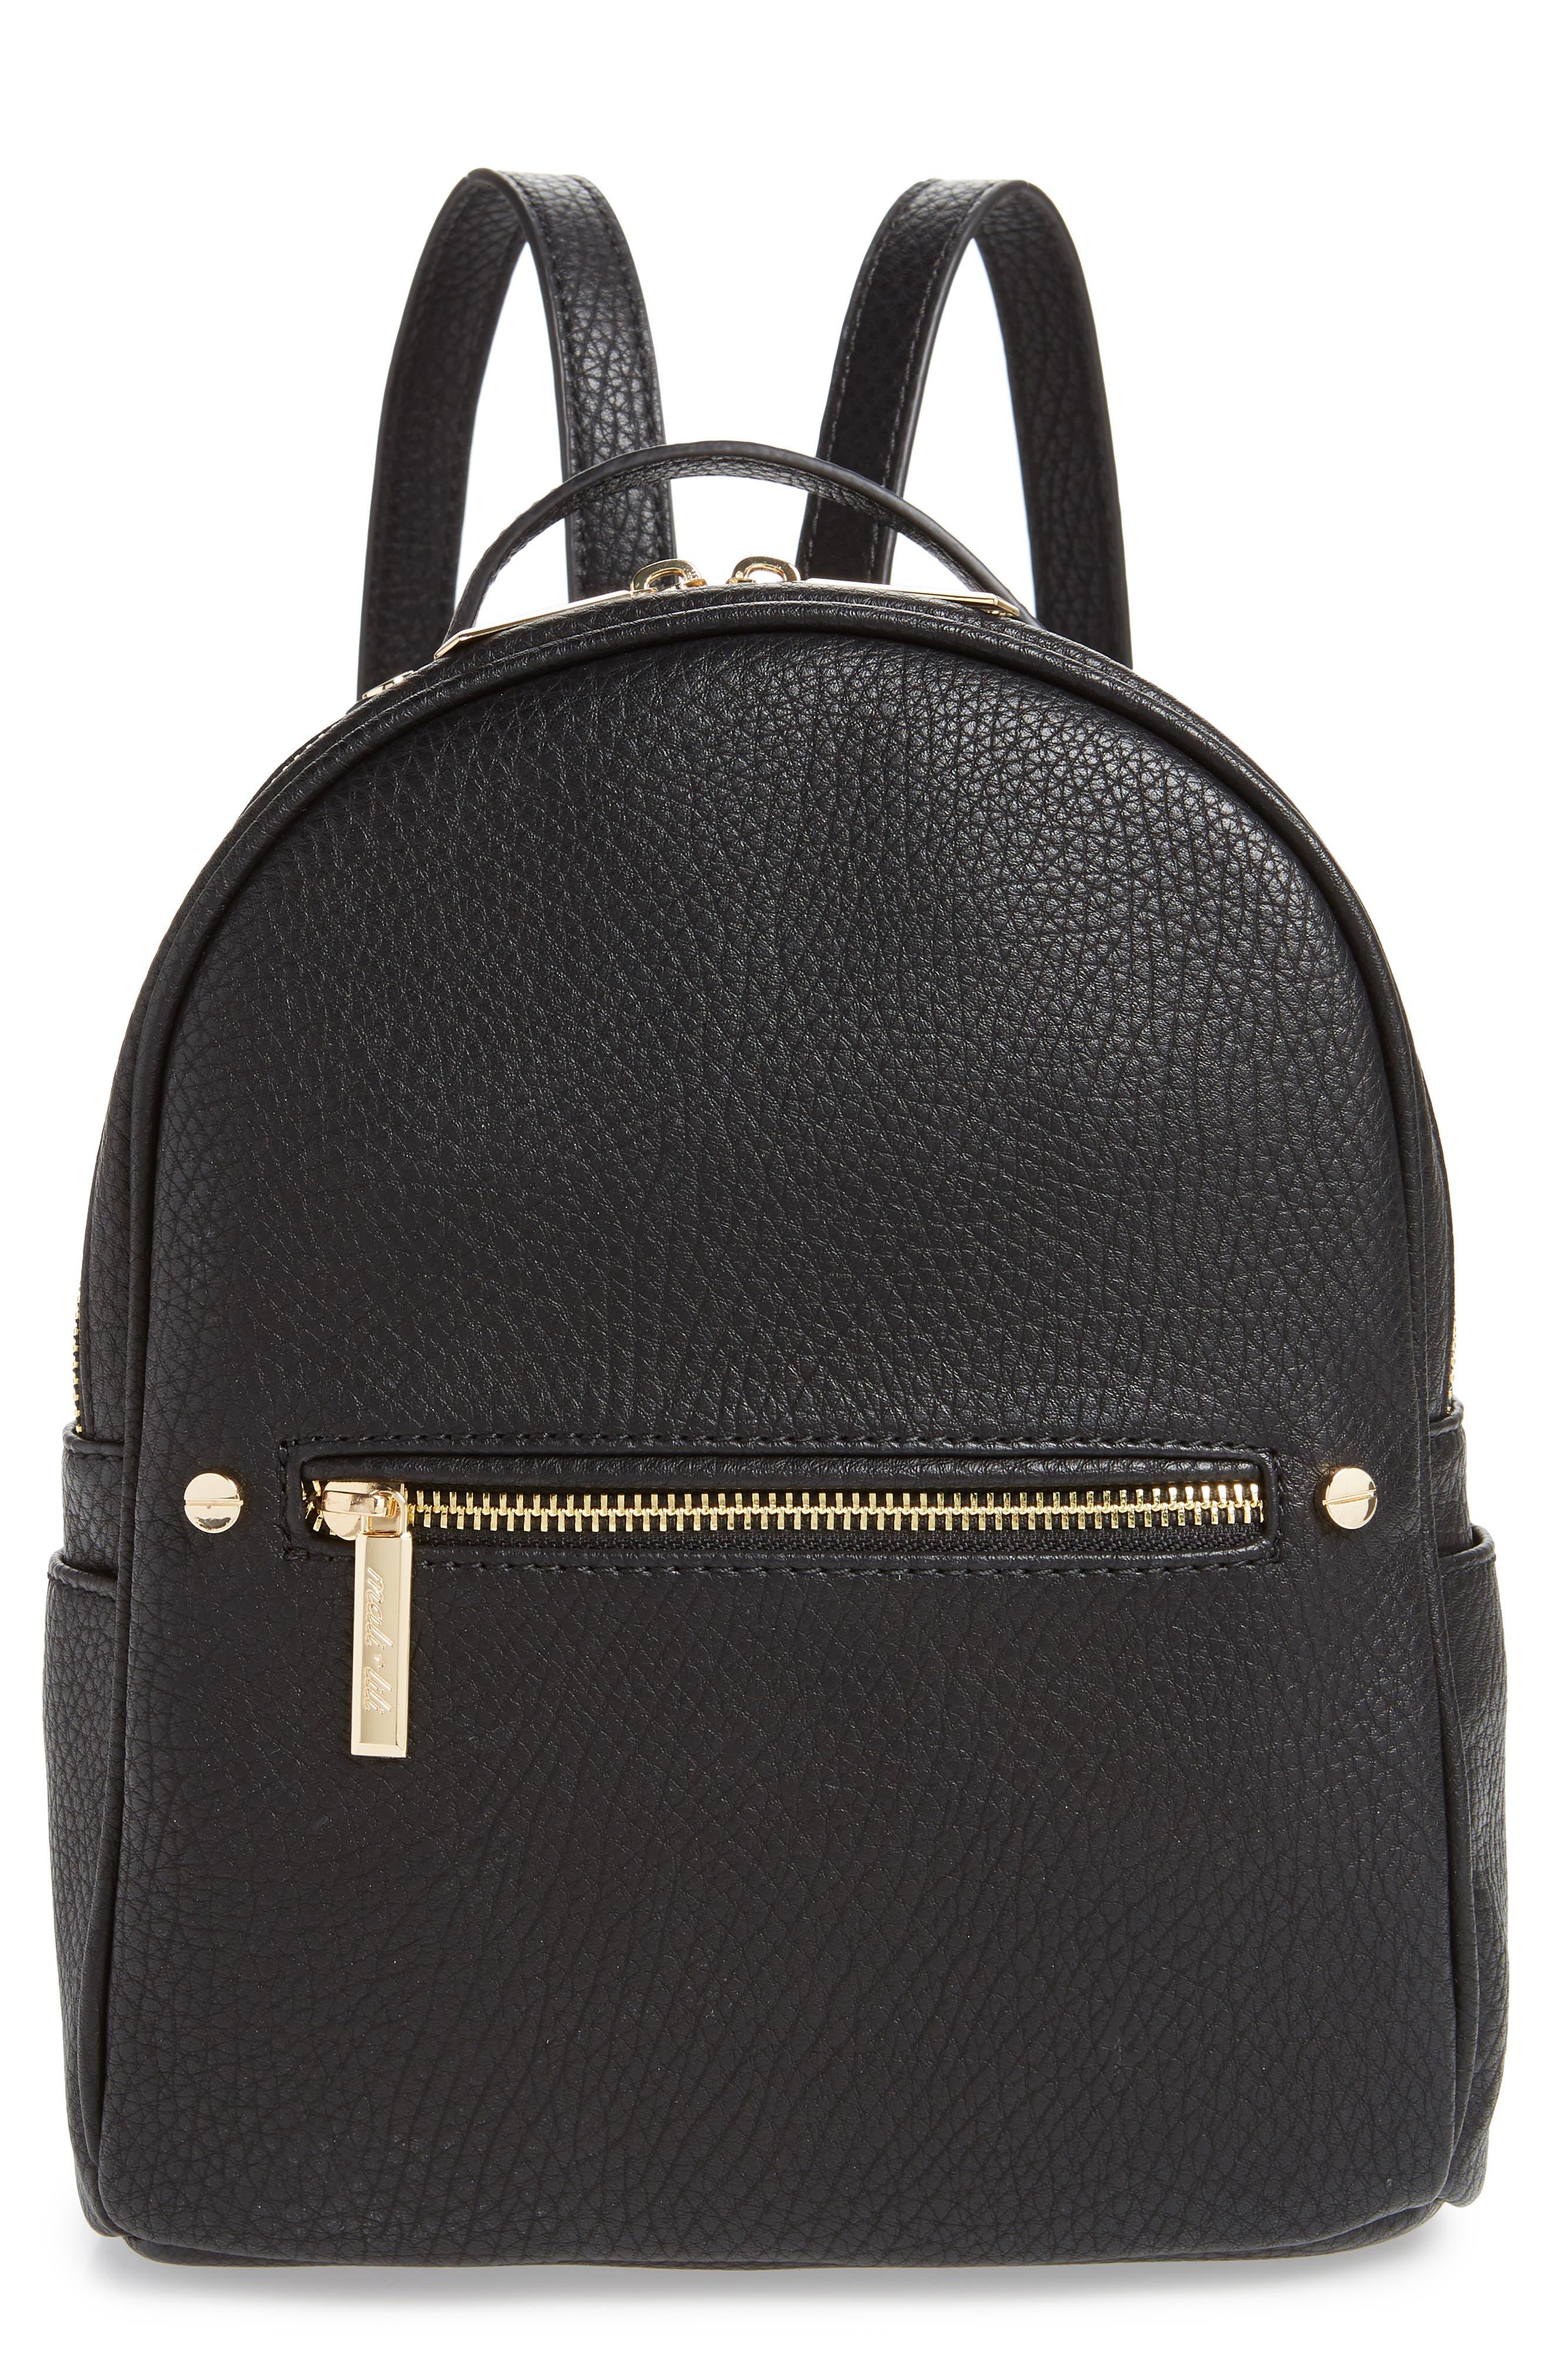 MALI + LILI,                             Hanny Vegan Leather Backpack,                             Main thumbnail 1, color,                             BLACK